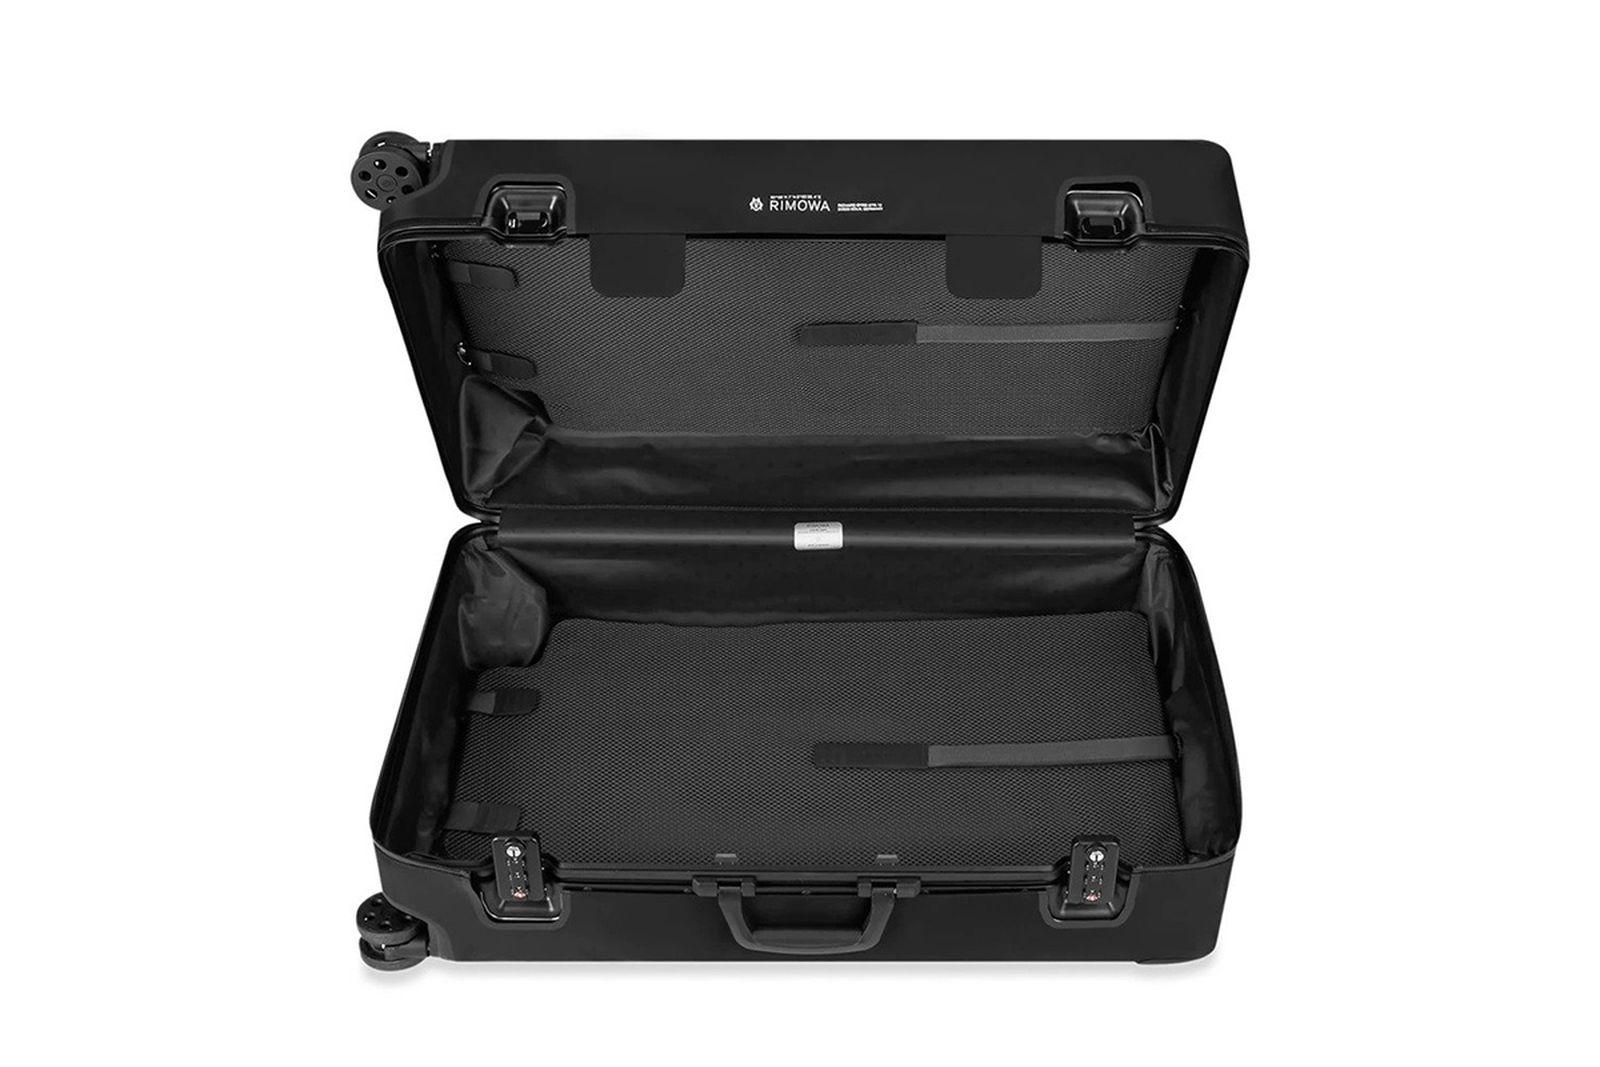 rimowa-luggage-suitcase-cover-01